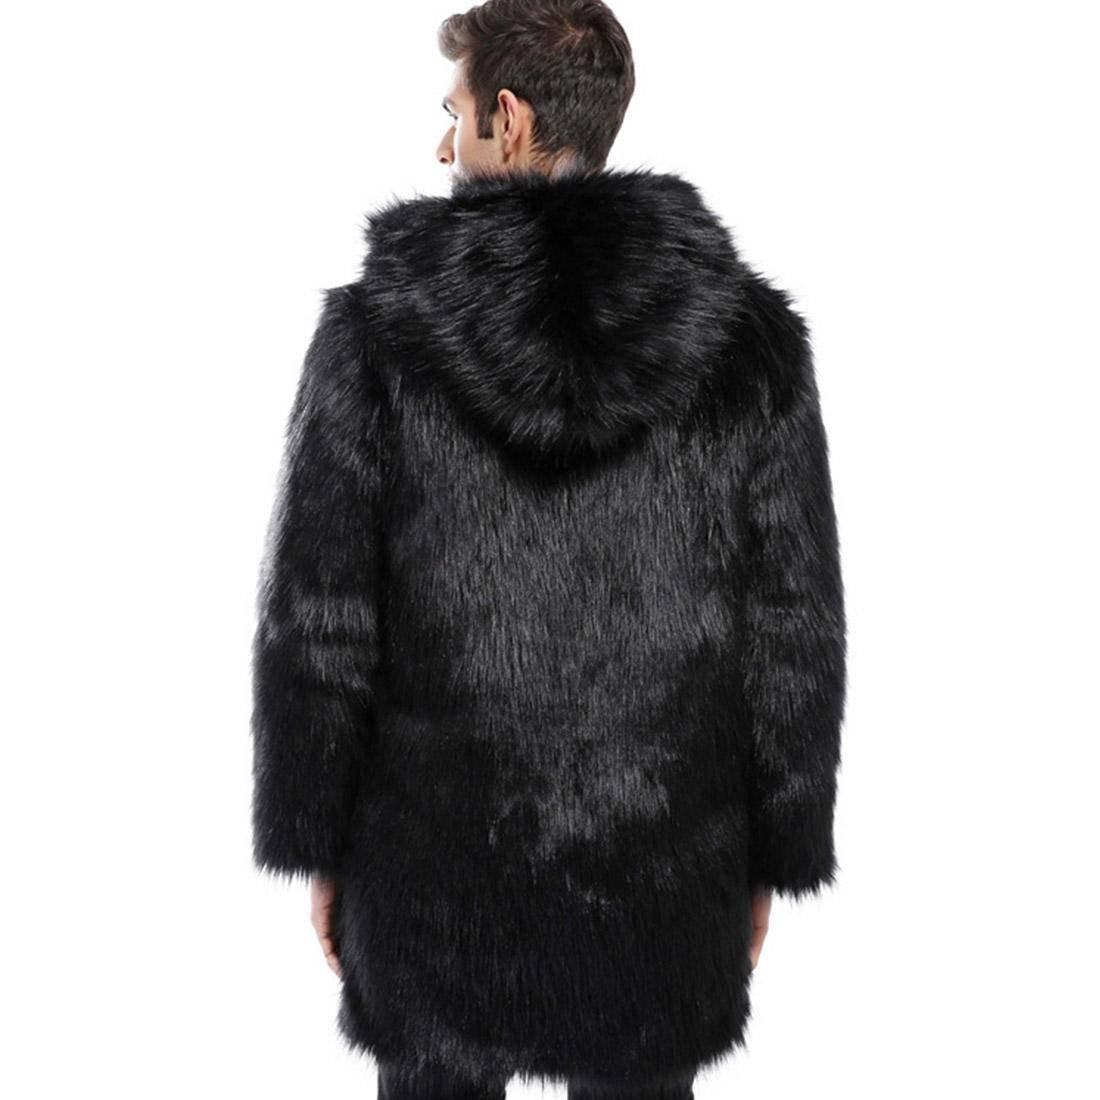 7cbd108f21ff Felljacke Kurz mit Mütze Design Herren Pelzmantel Kunst,AKAUFENG  Winterjacke Mantel Kunstpelz lange Jacke Faux Fur für Männer  Amazon.de   Bekleidung